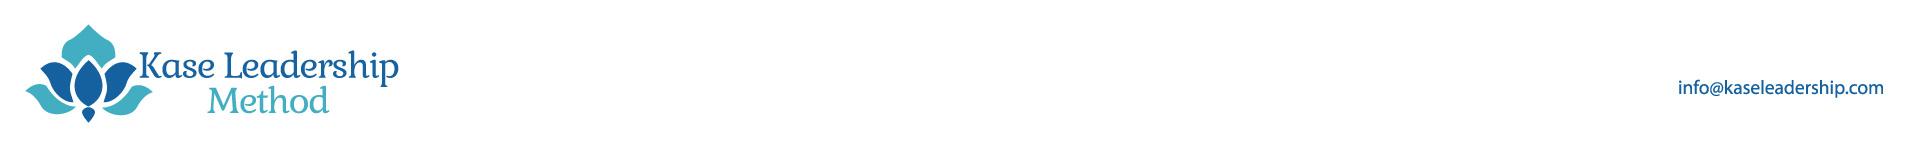 Kase Leadership logo and email